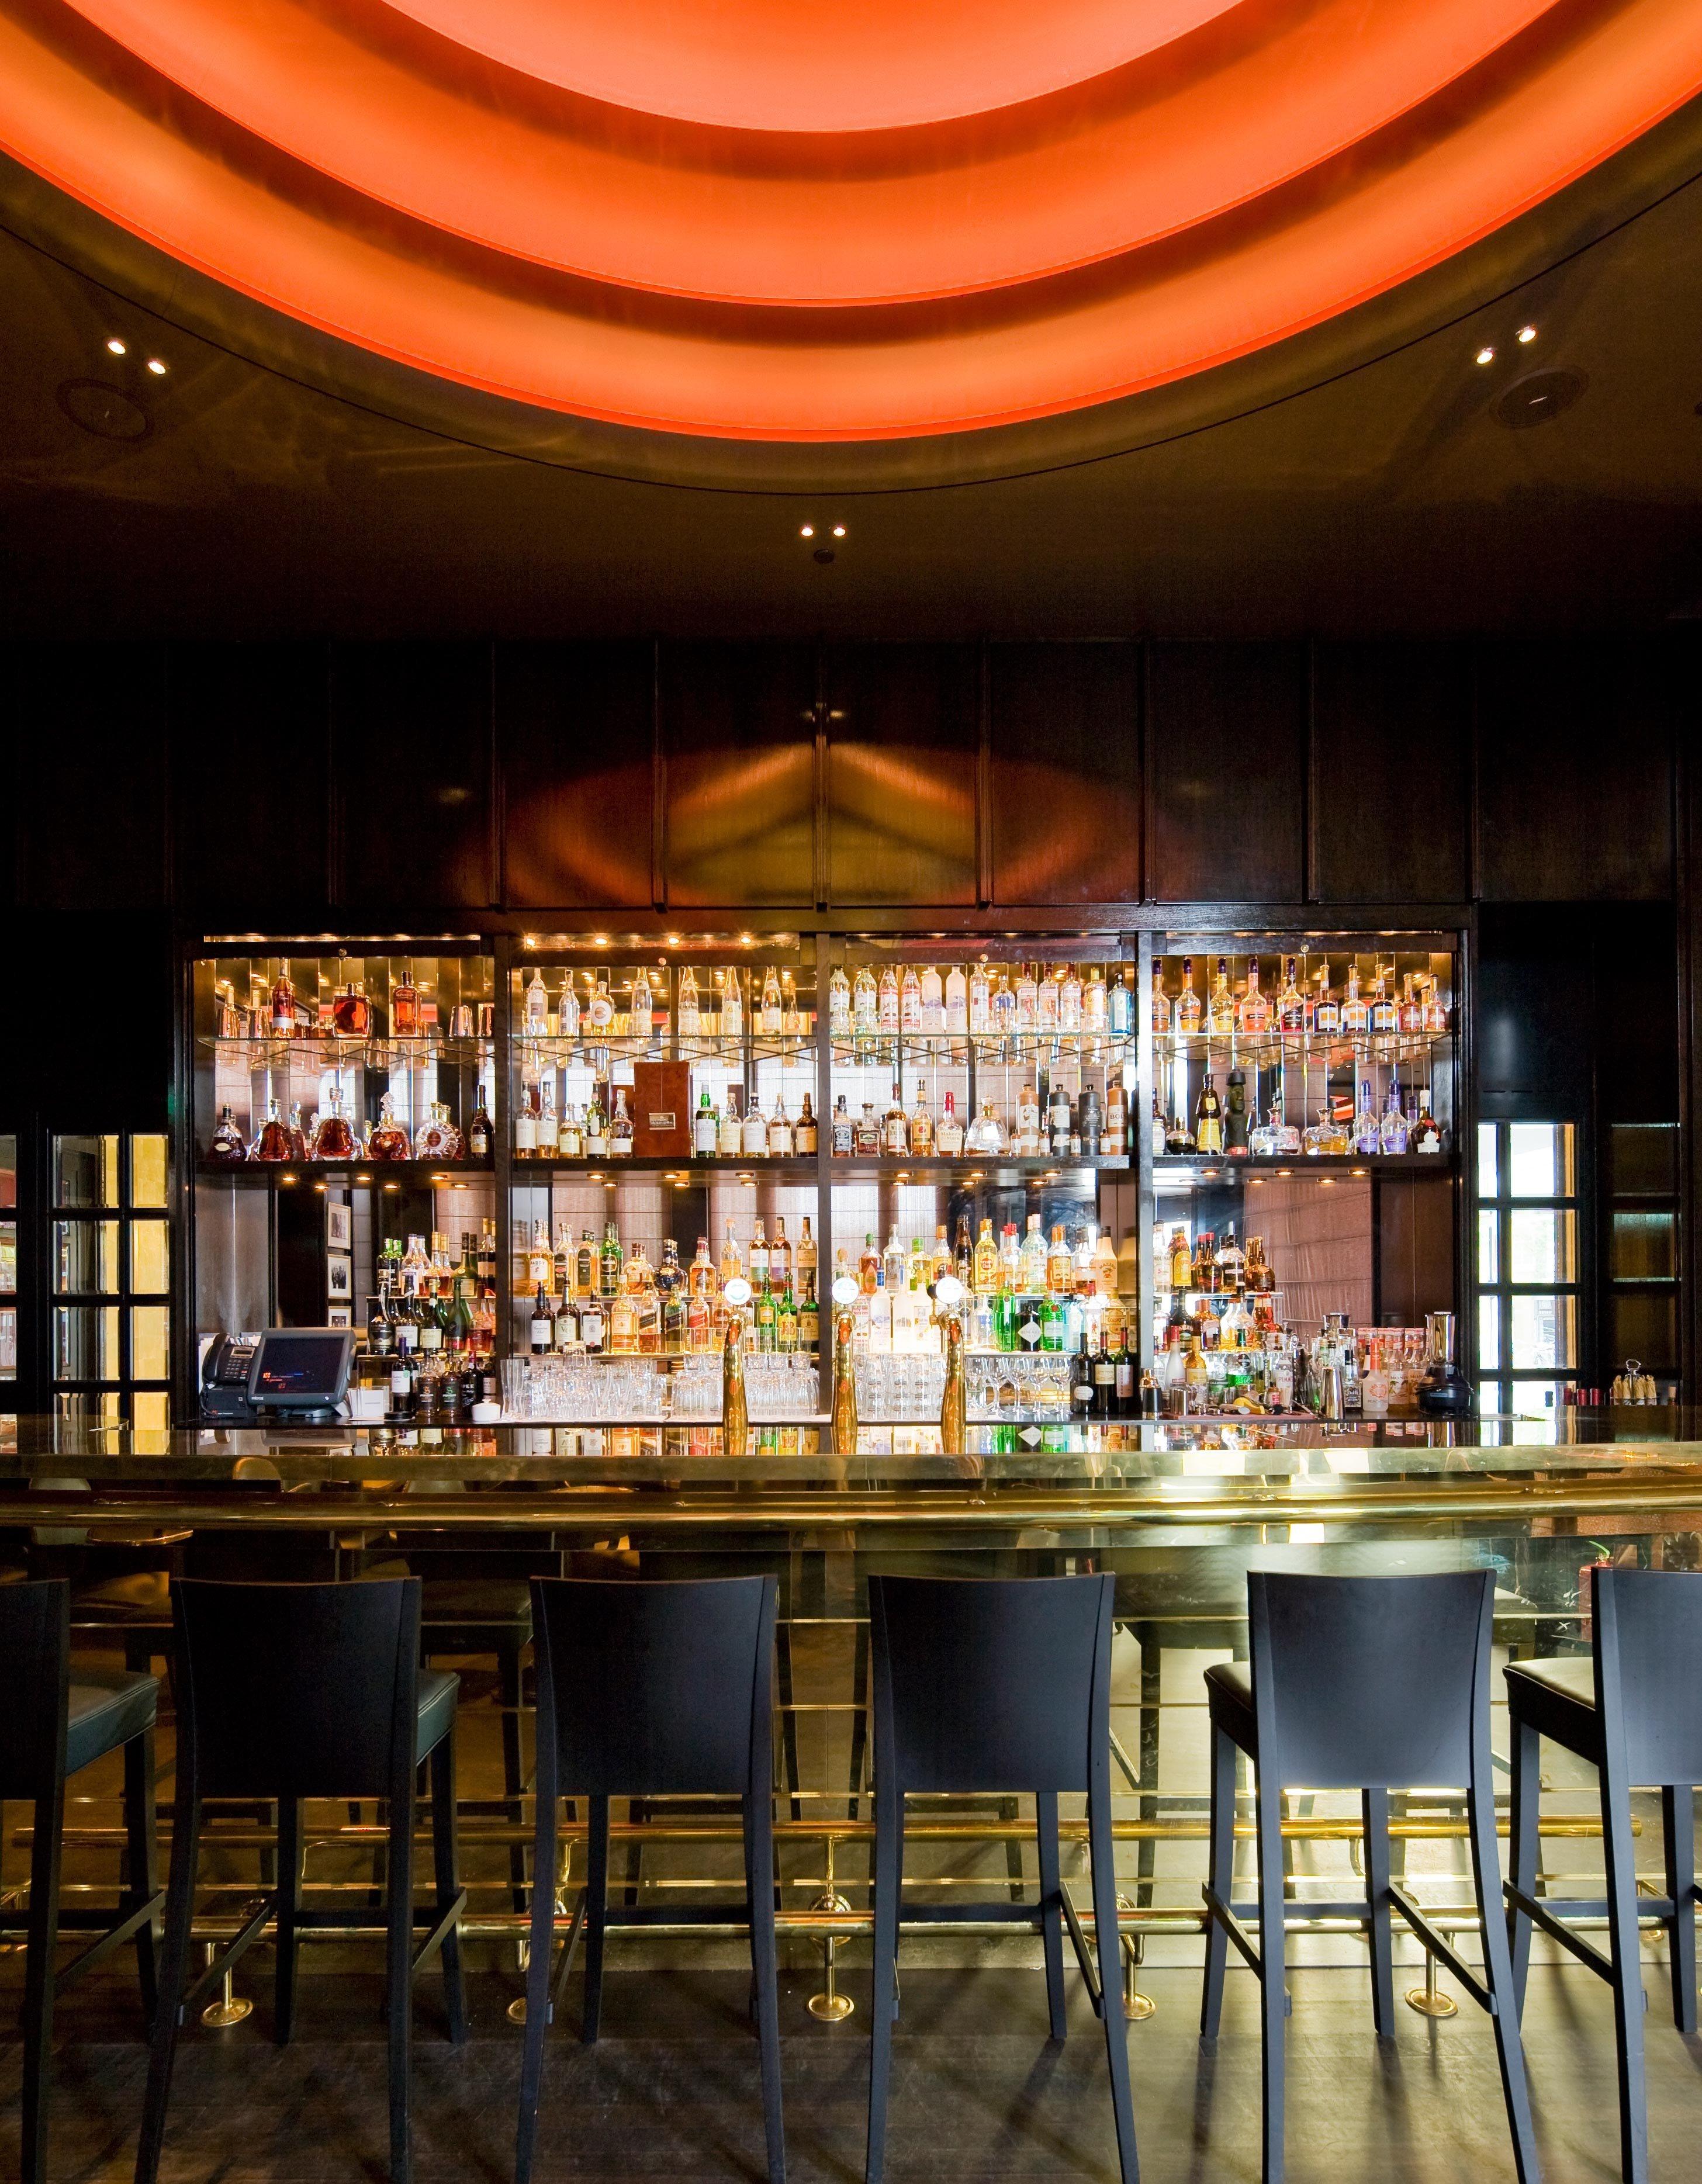 Amsterdam Bar Drink Hotels Nightlife The Netherlands ceiling indoor floor room restaurant interior design meal function hall area